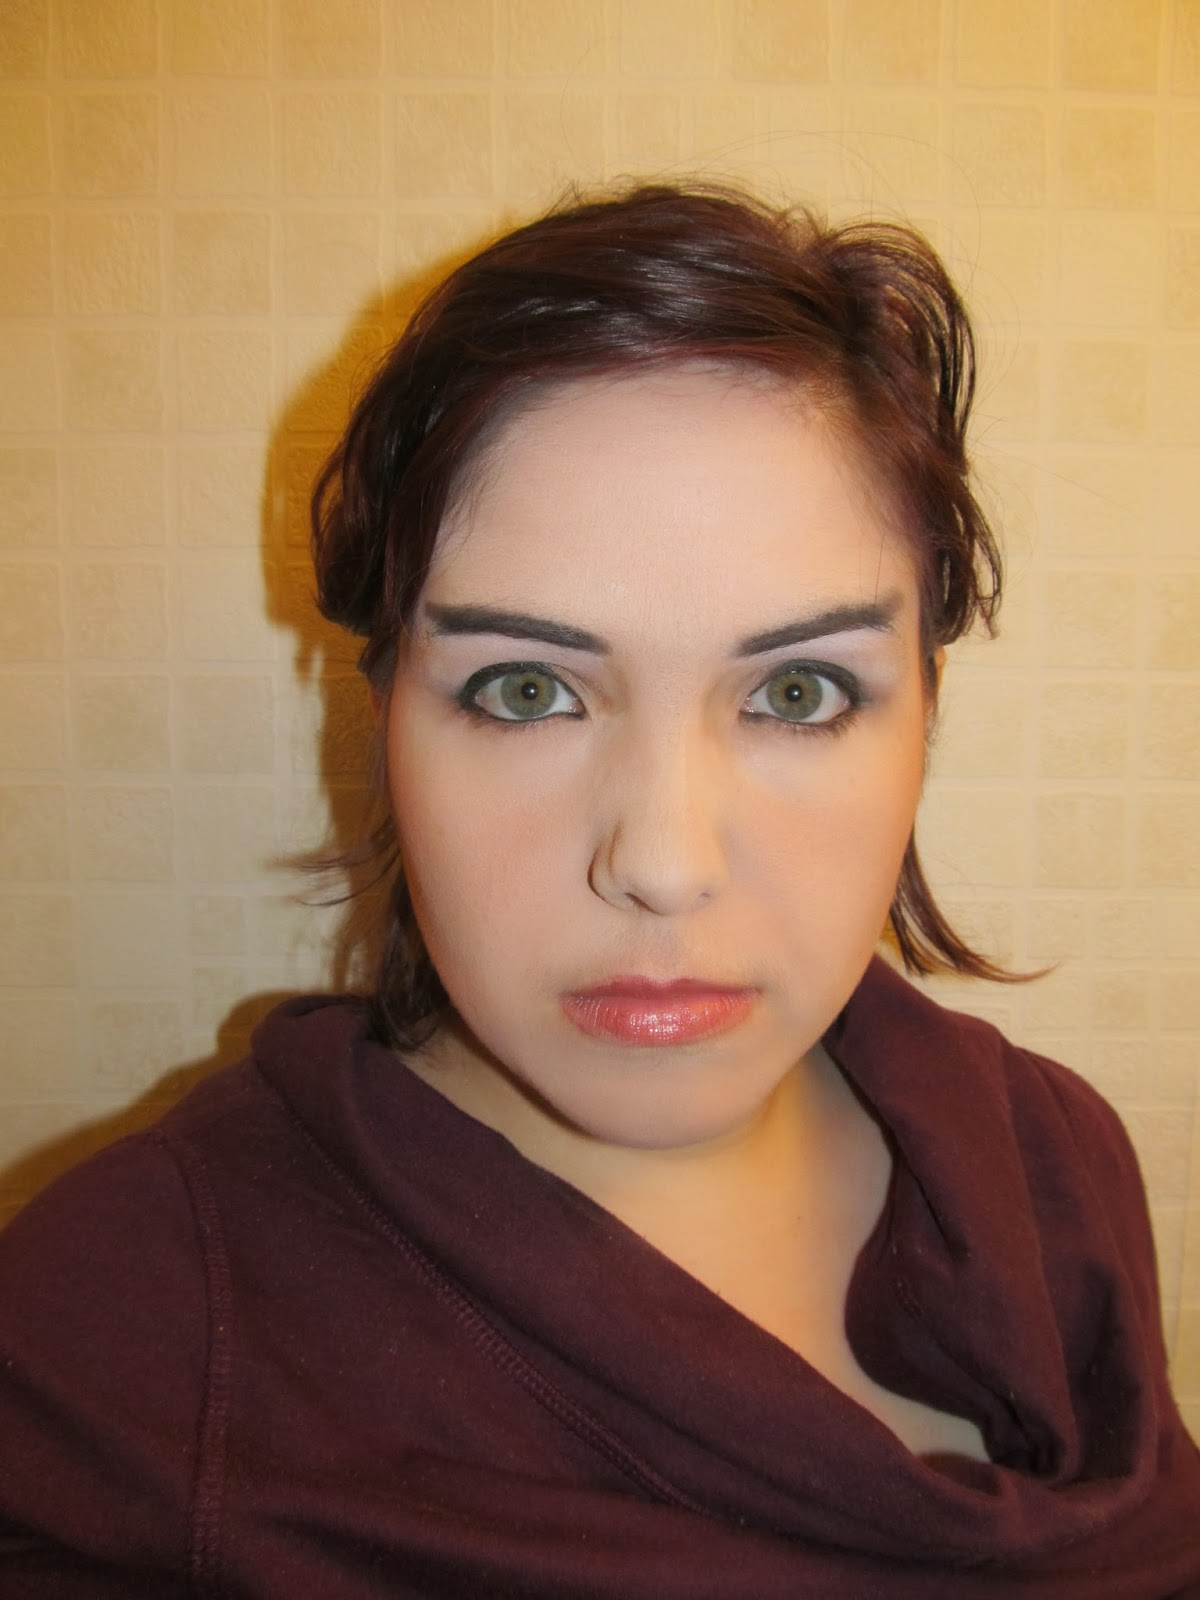 Maquillage inspiré des Vulcains (Star Trek) #Halloween